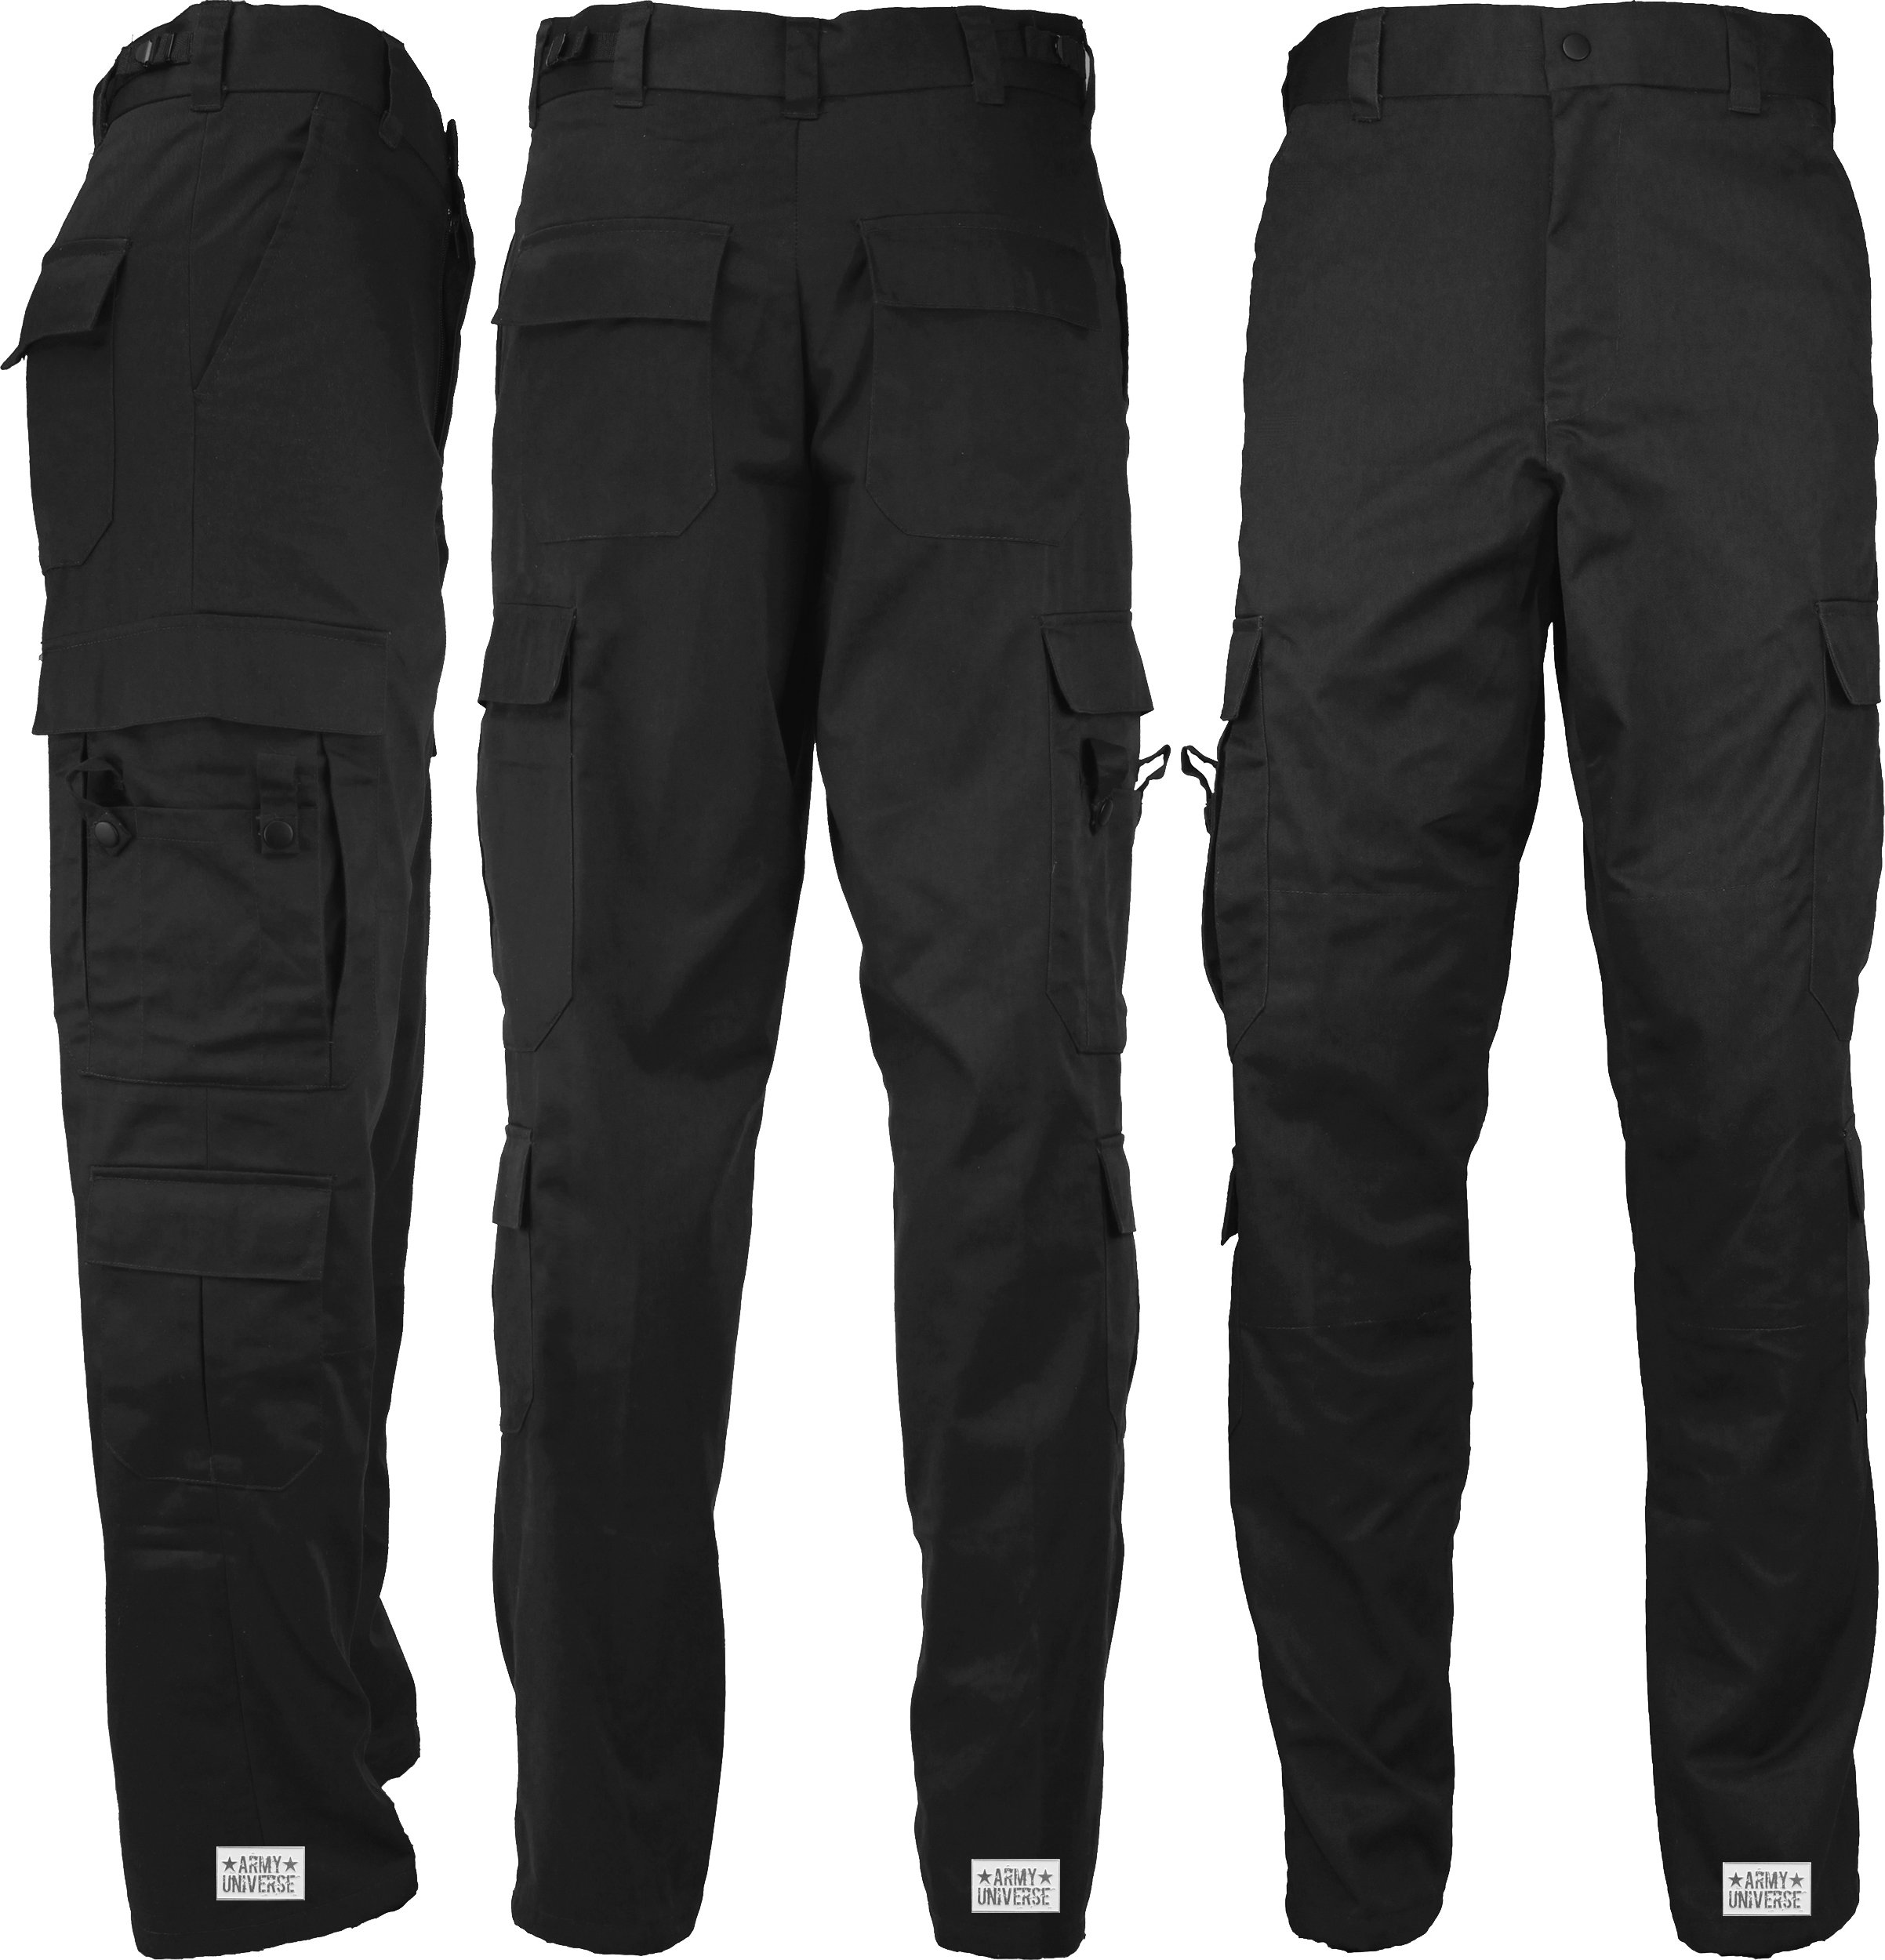 Army Universe Black Uniform 9 Pocket Cargo Pants 857383b83f4